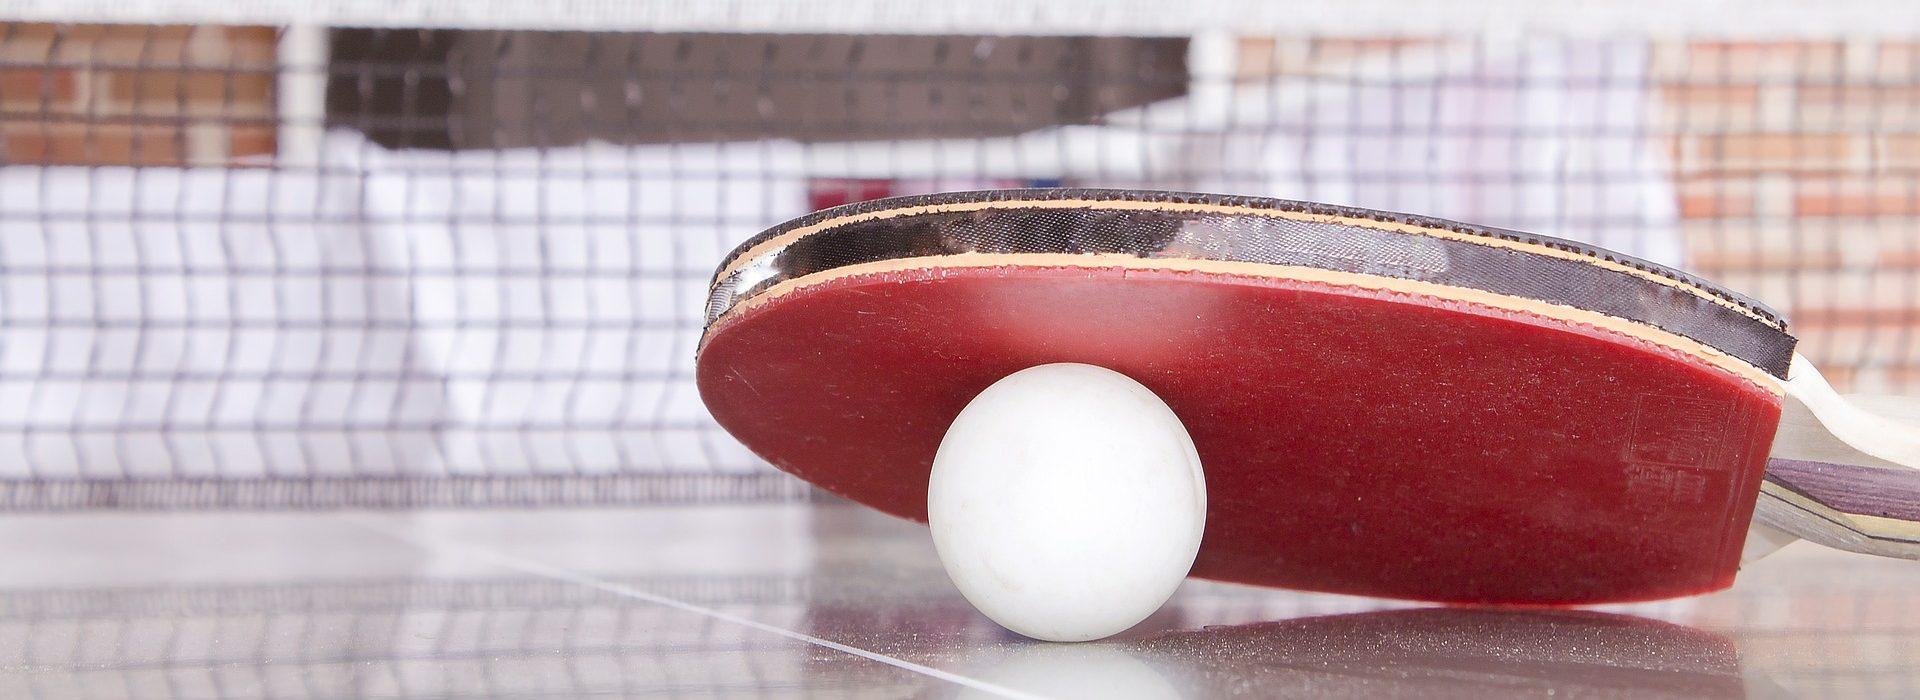 table-tennis-1708418_1920